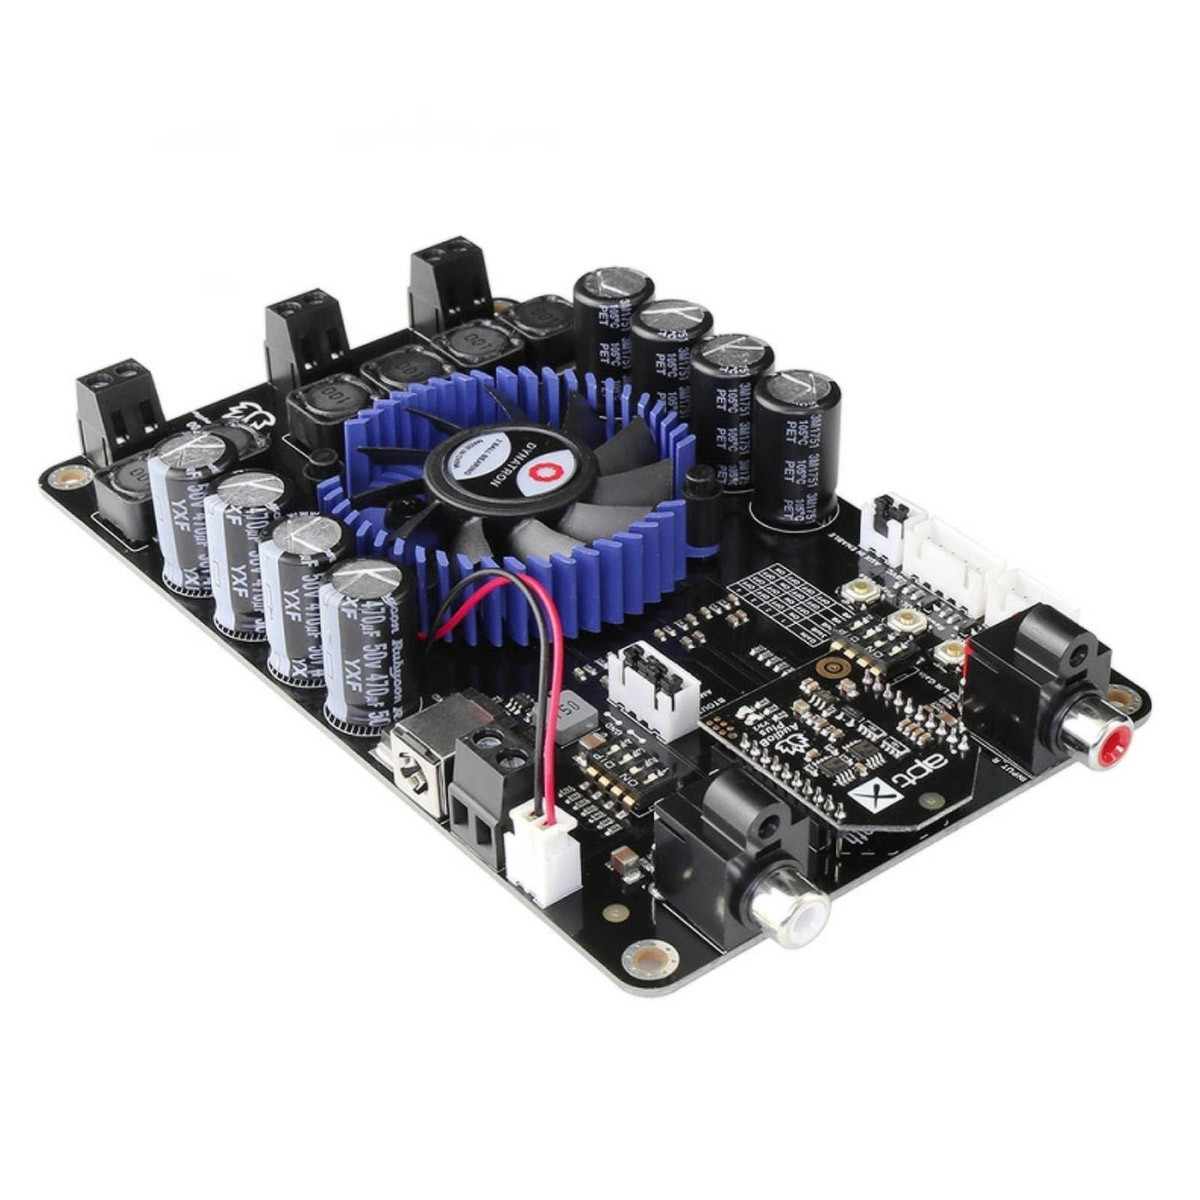 TINYSINE TSA7500B 2.1 Amplifier Module Bluetooth TPA3221 aptX 2x100W + 200W